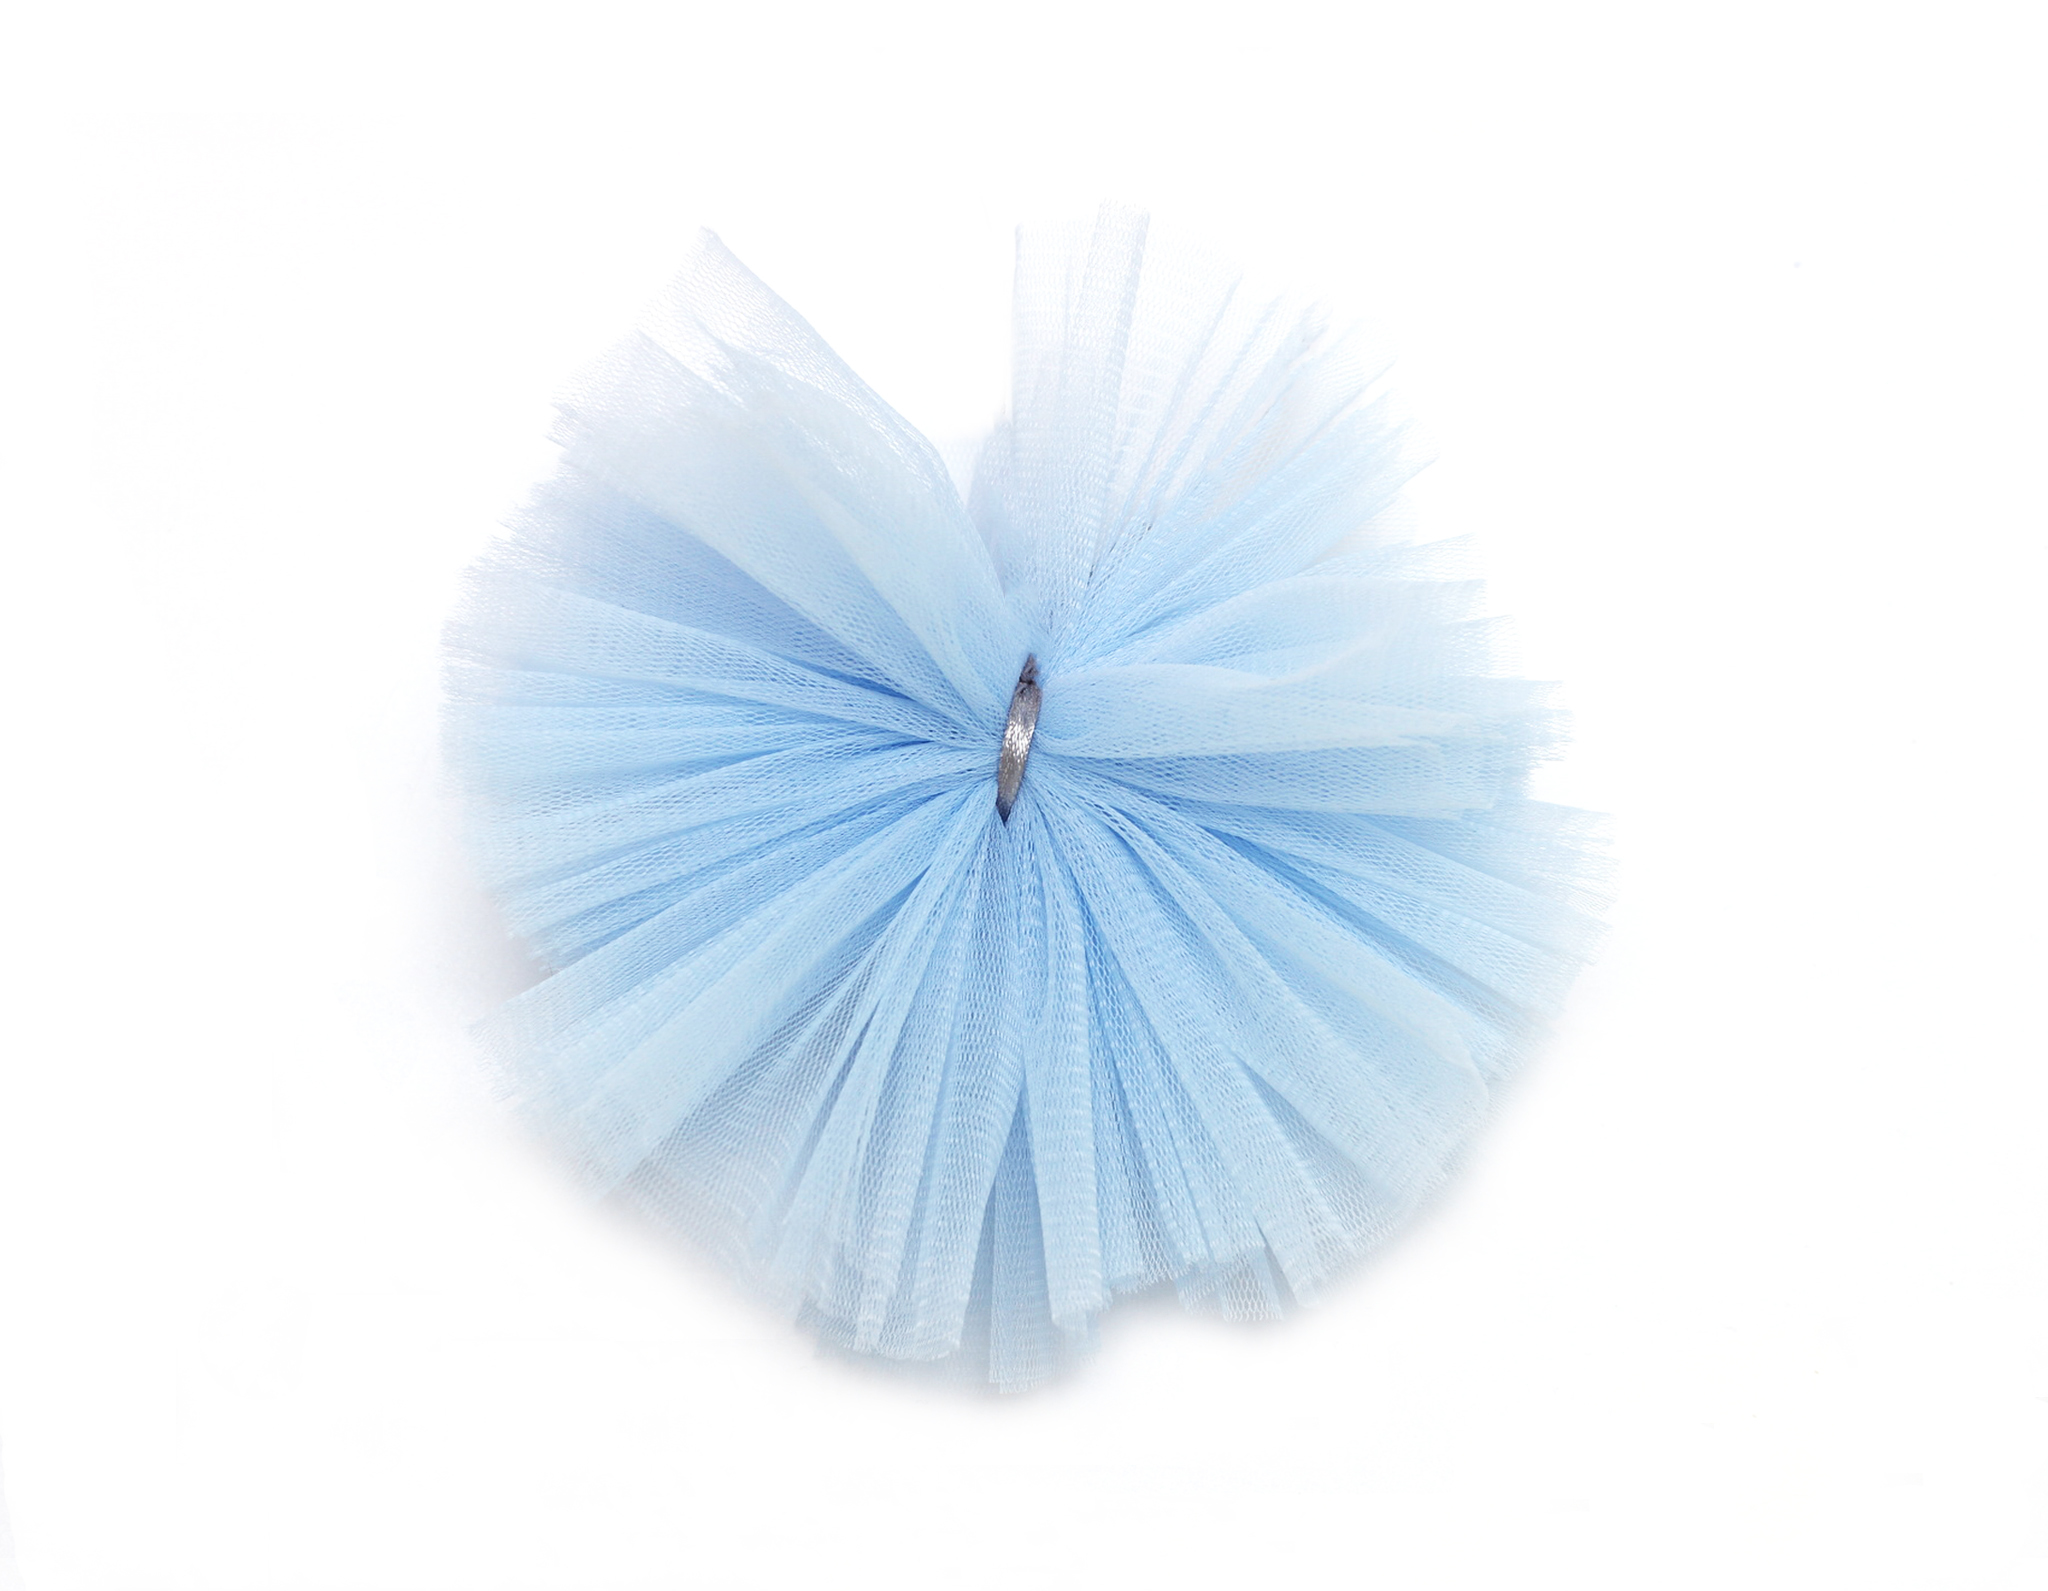 Еврофатин голубой